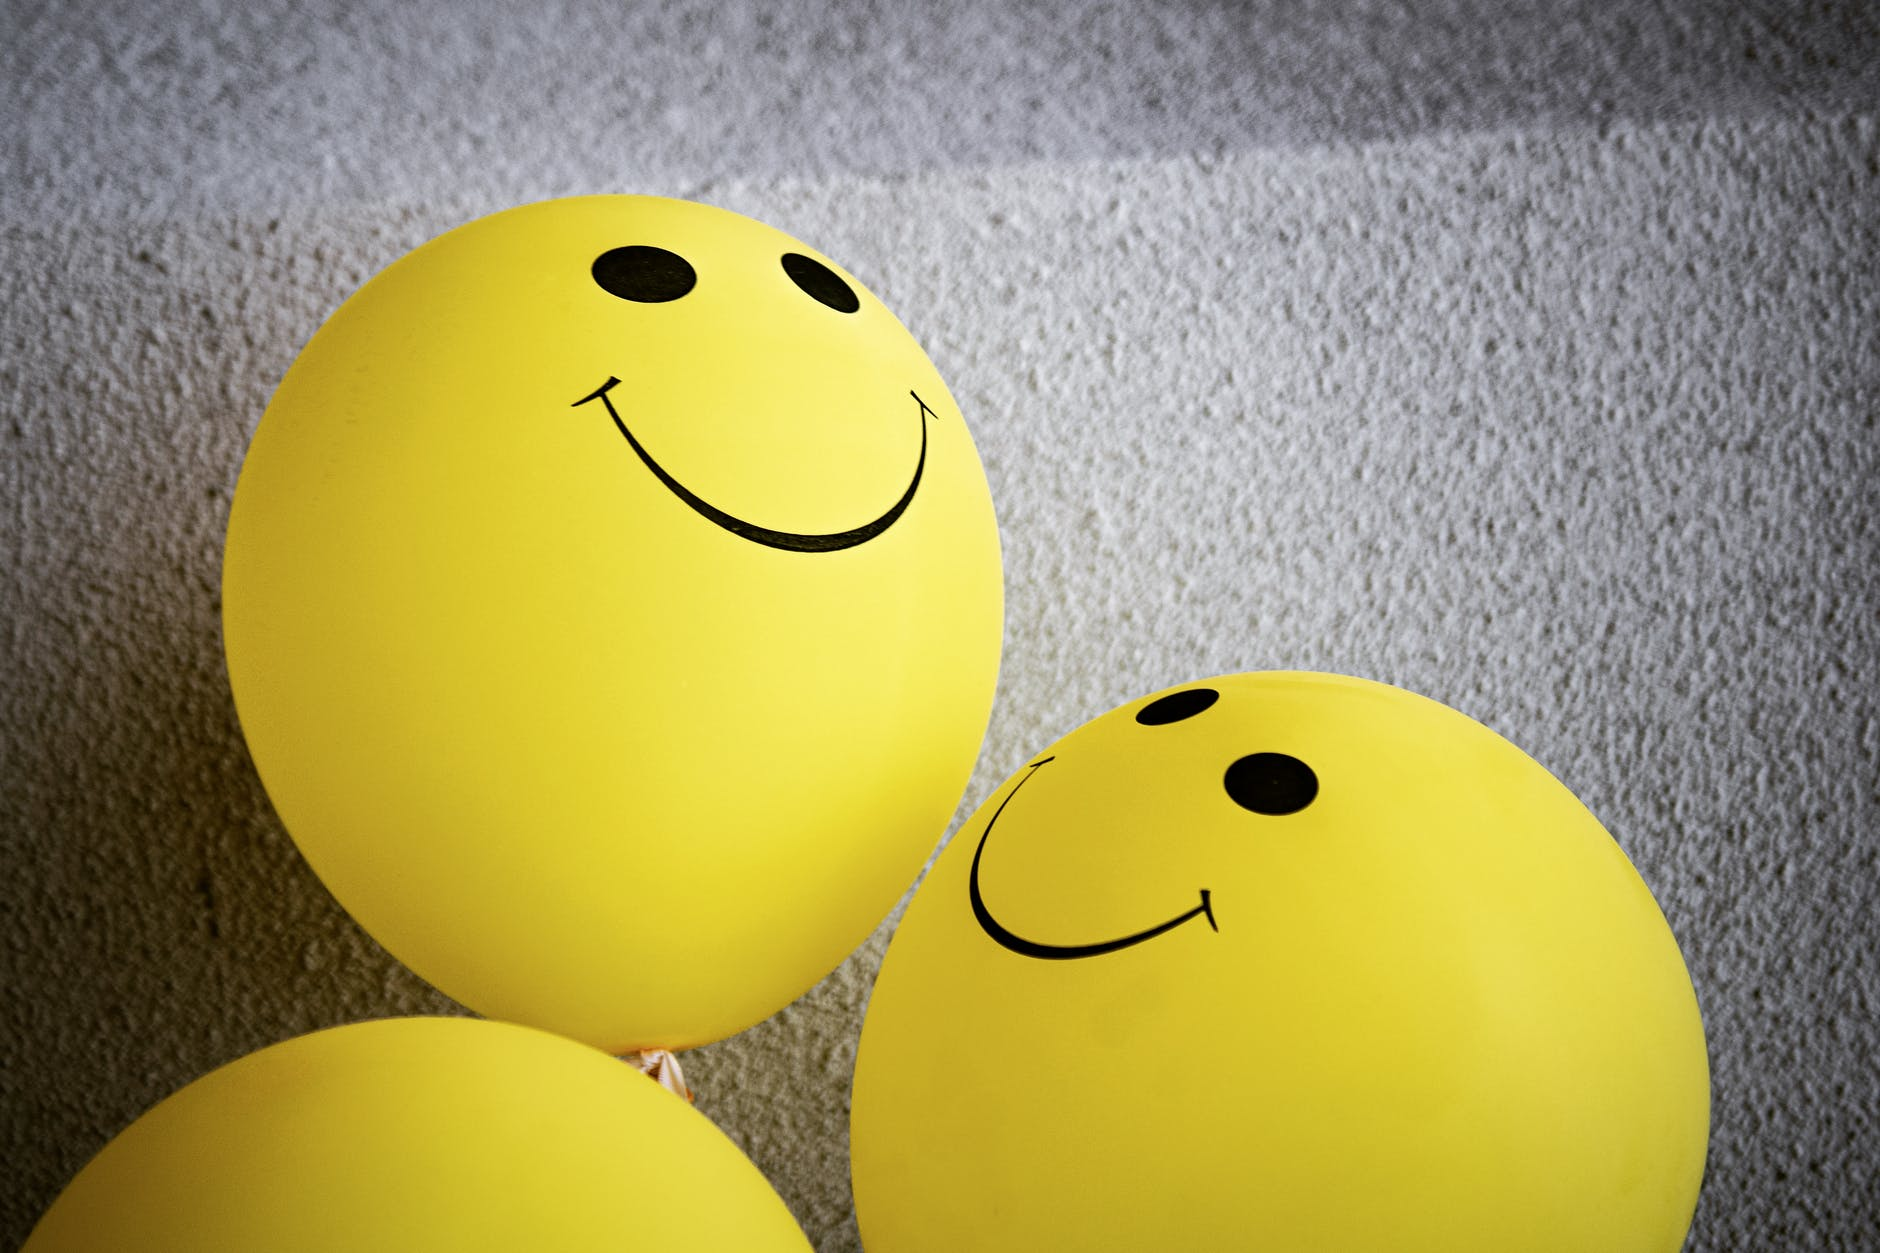 yellow smiley emoji on gray surface